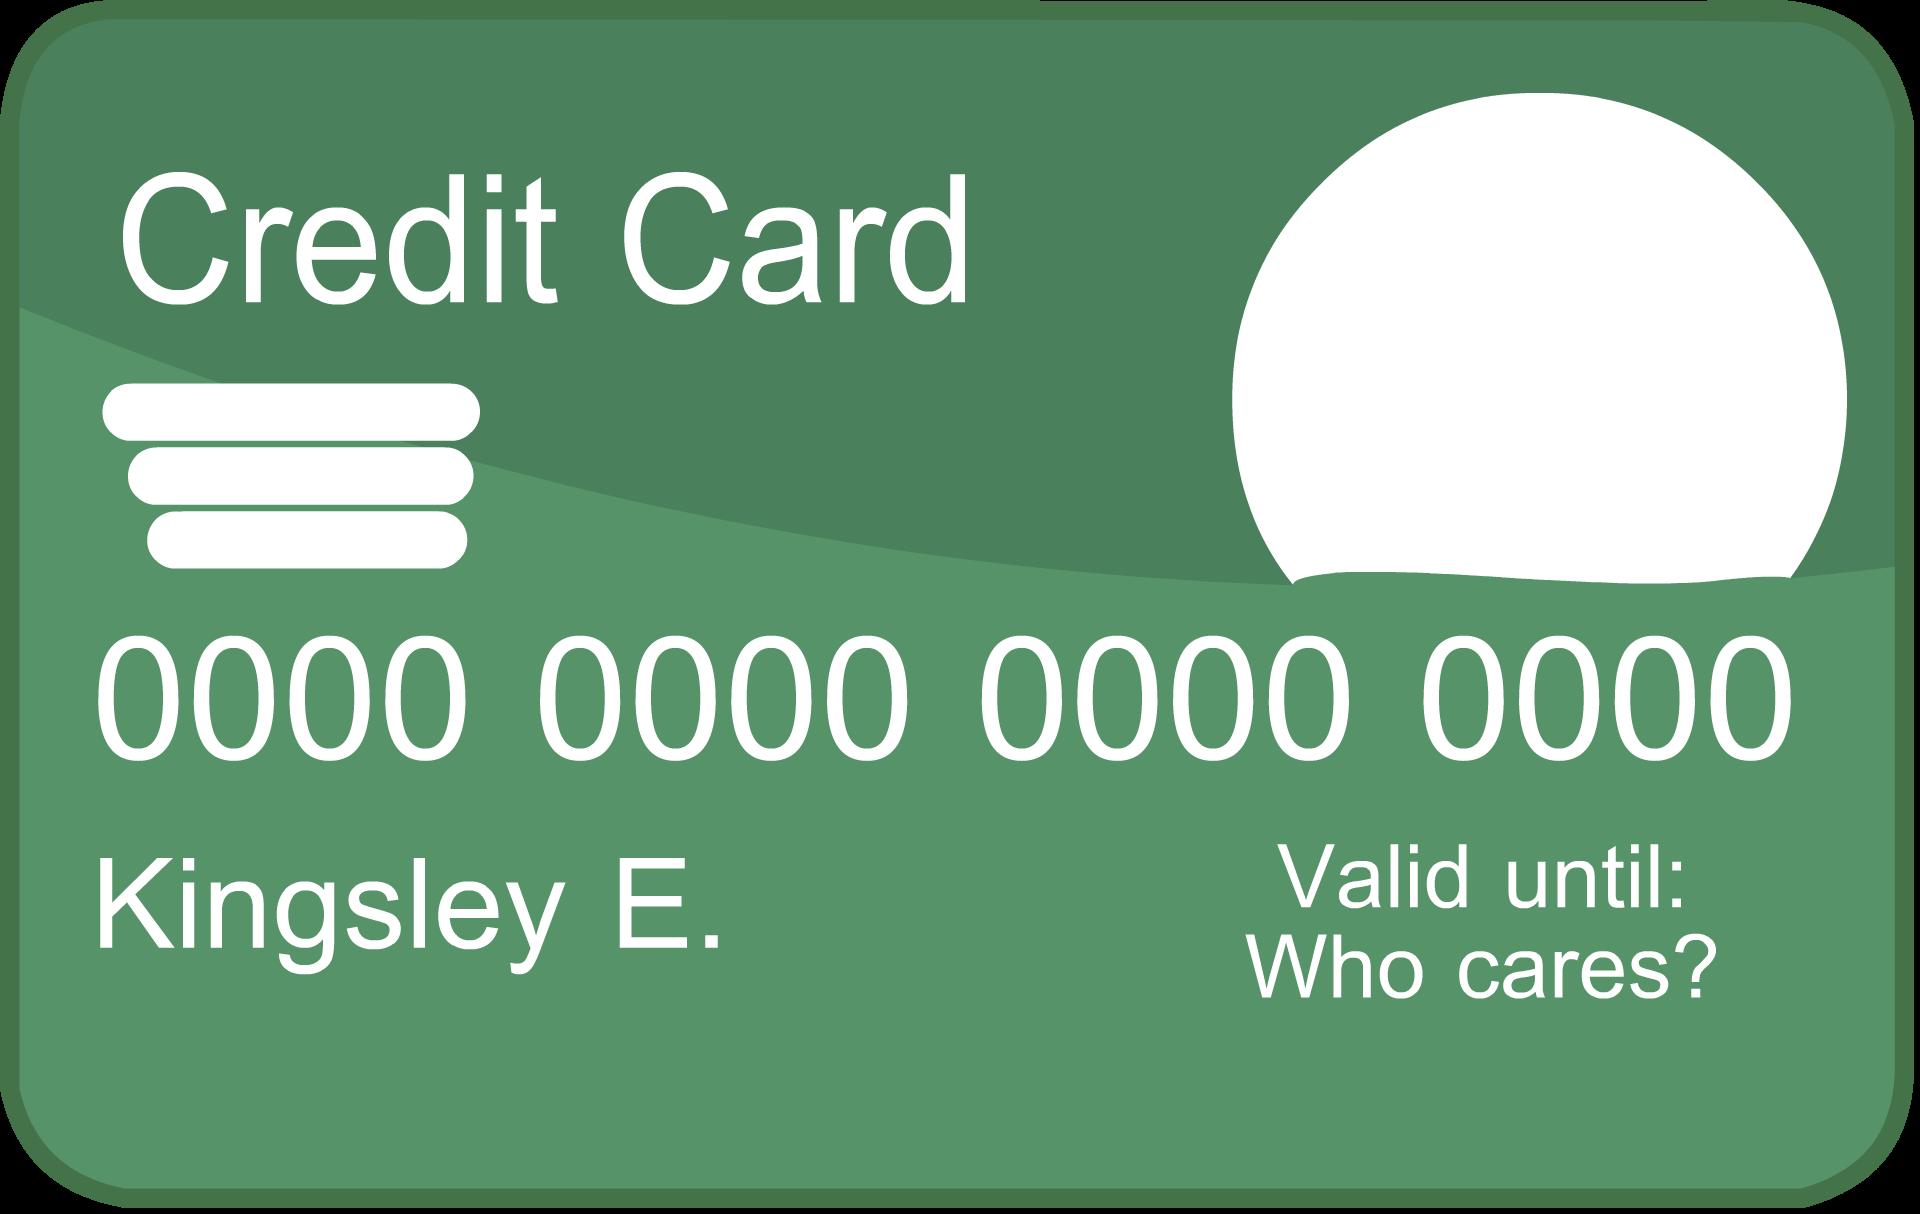 Credit Card PNG - 24314